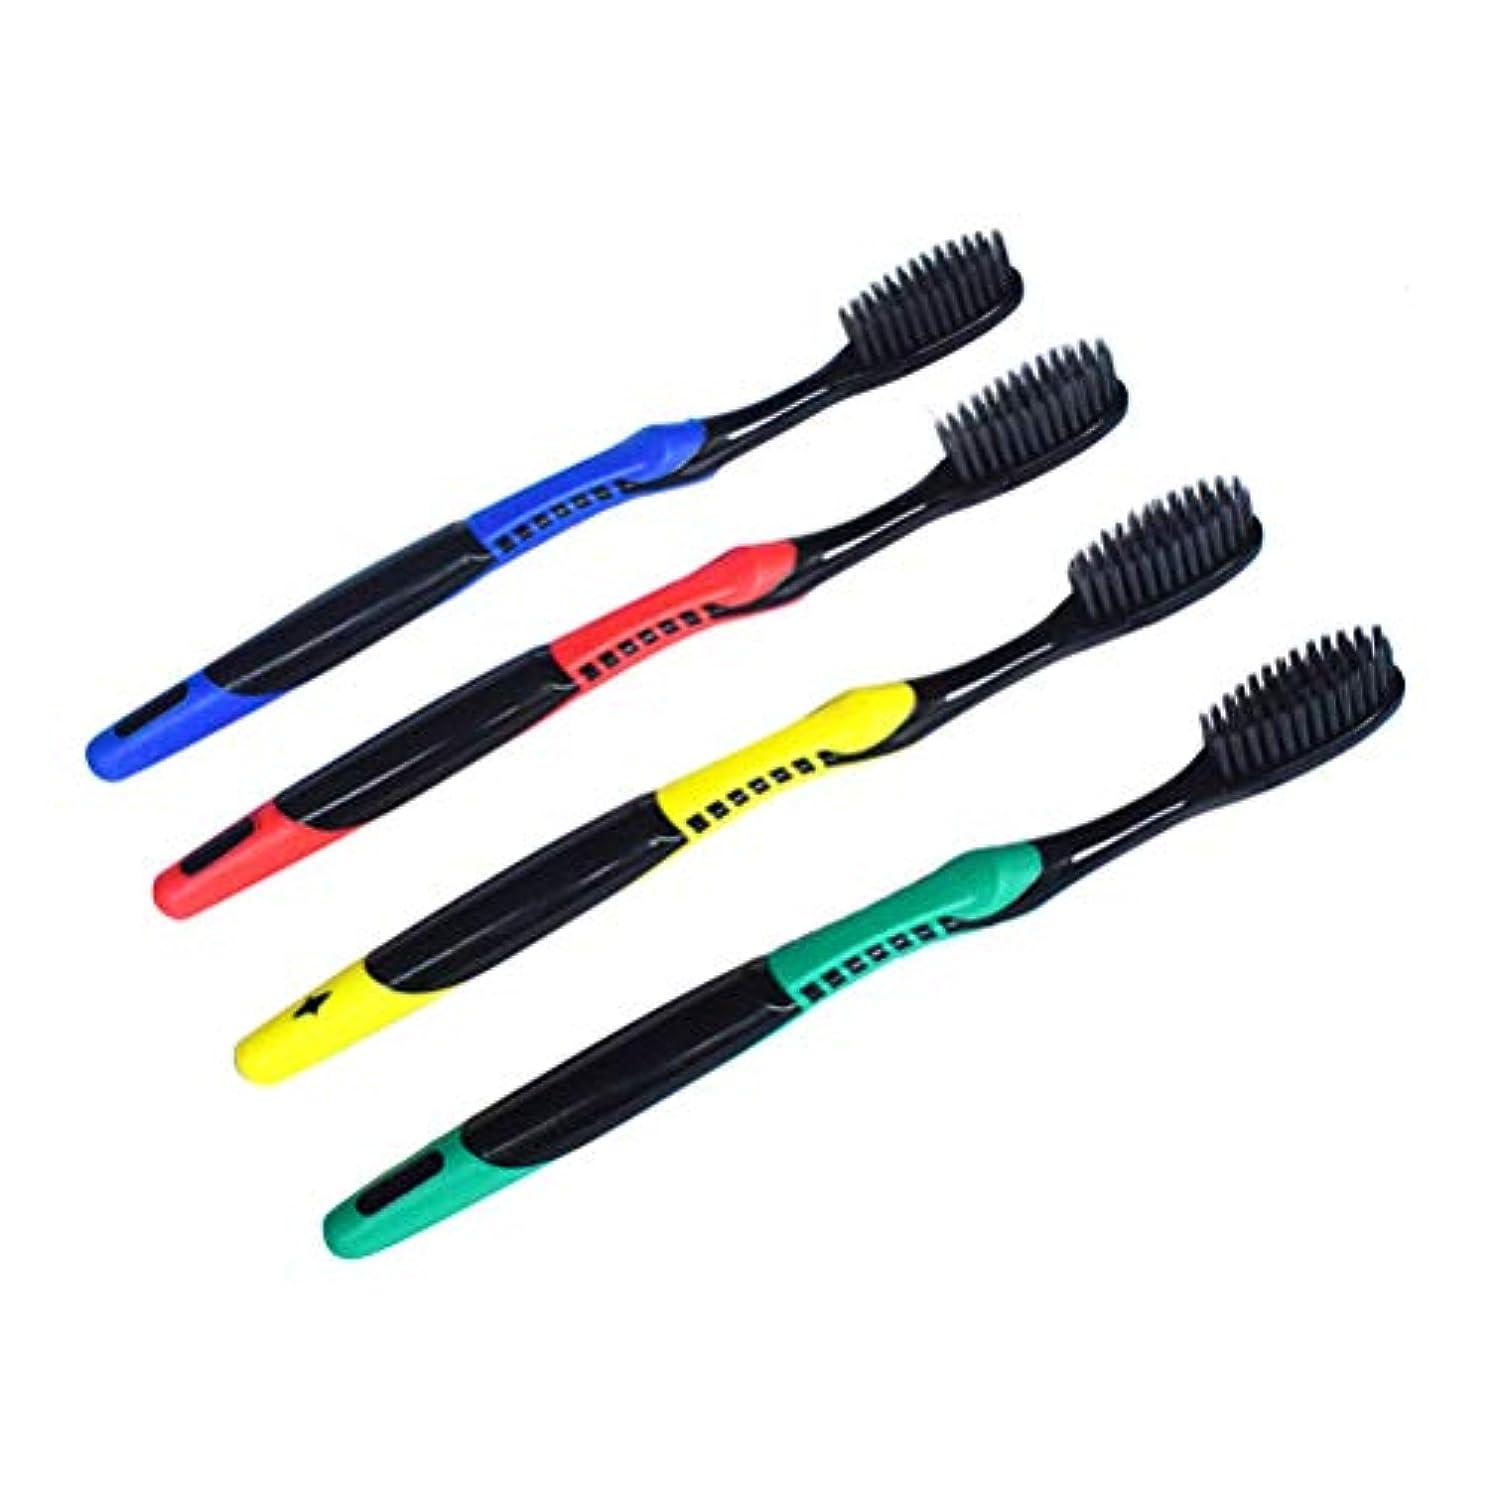 Healifty 家庭用電車旅行用ソフト環境に優しい歯ブラシ8PC竹炭パッパス歯ブラシ(混色)